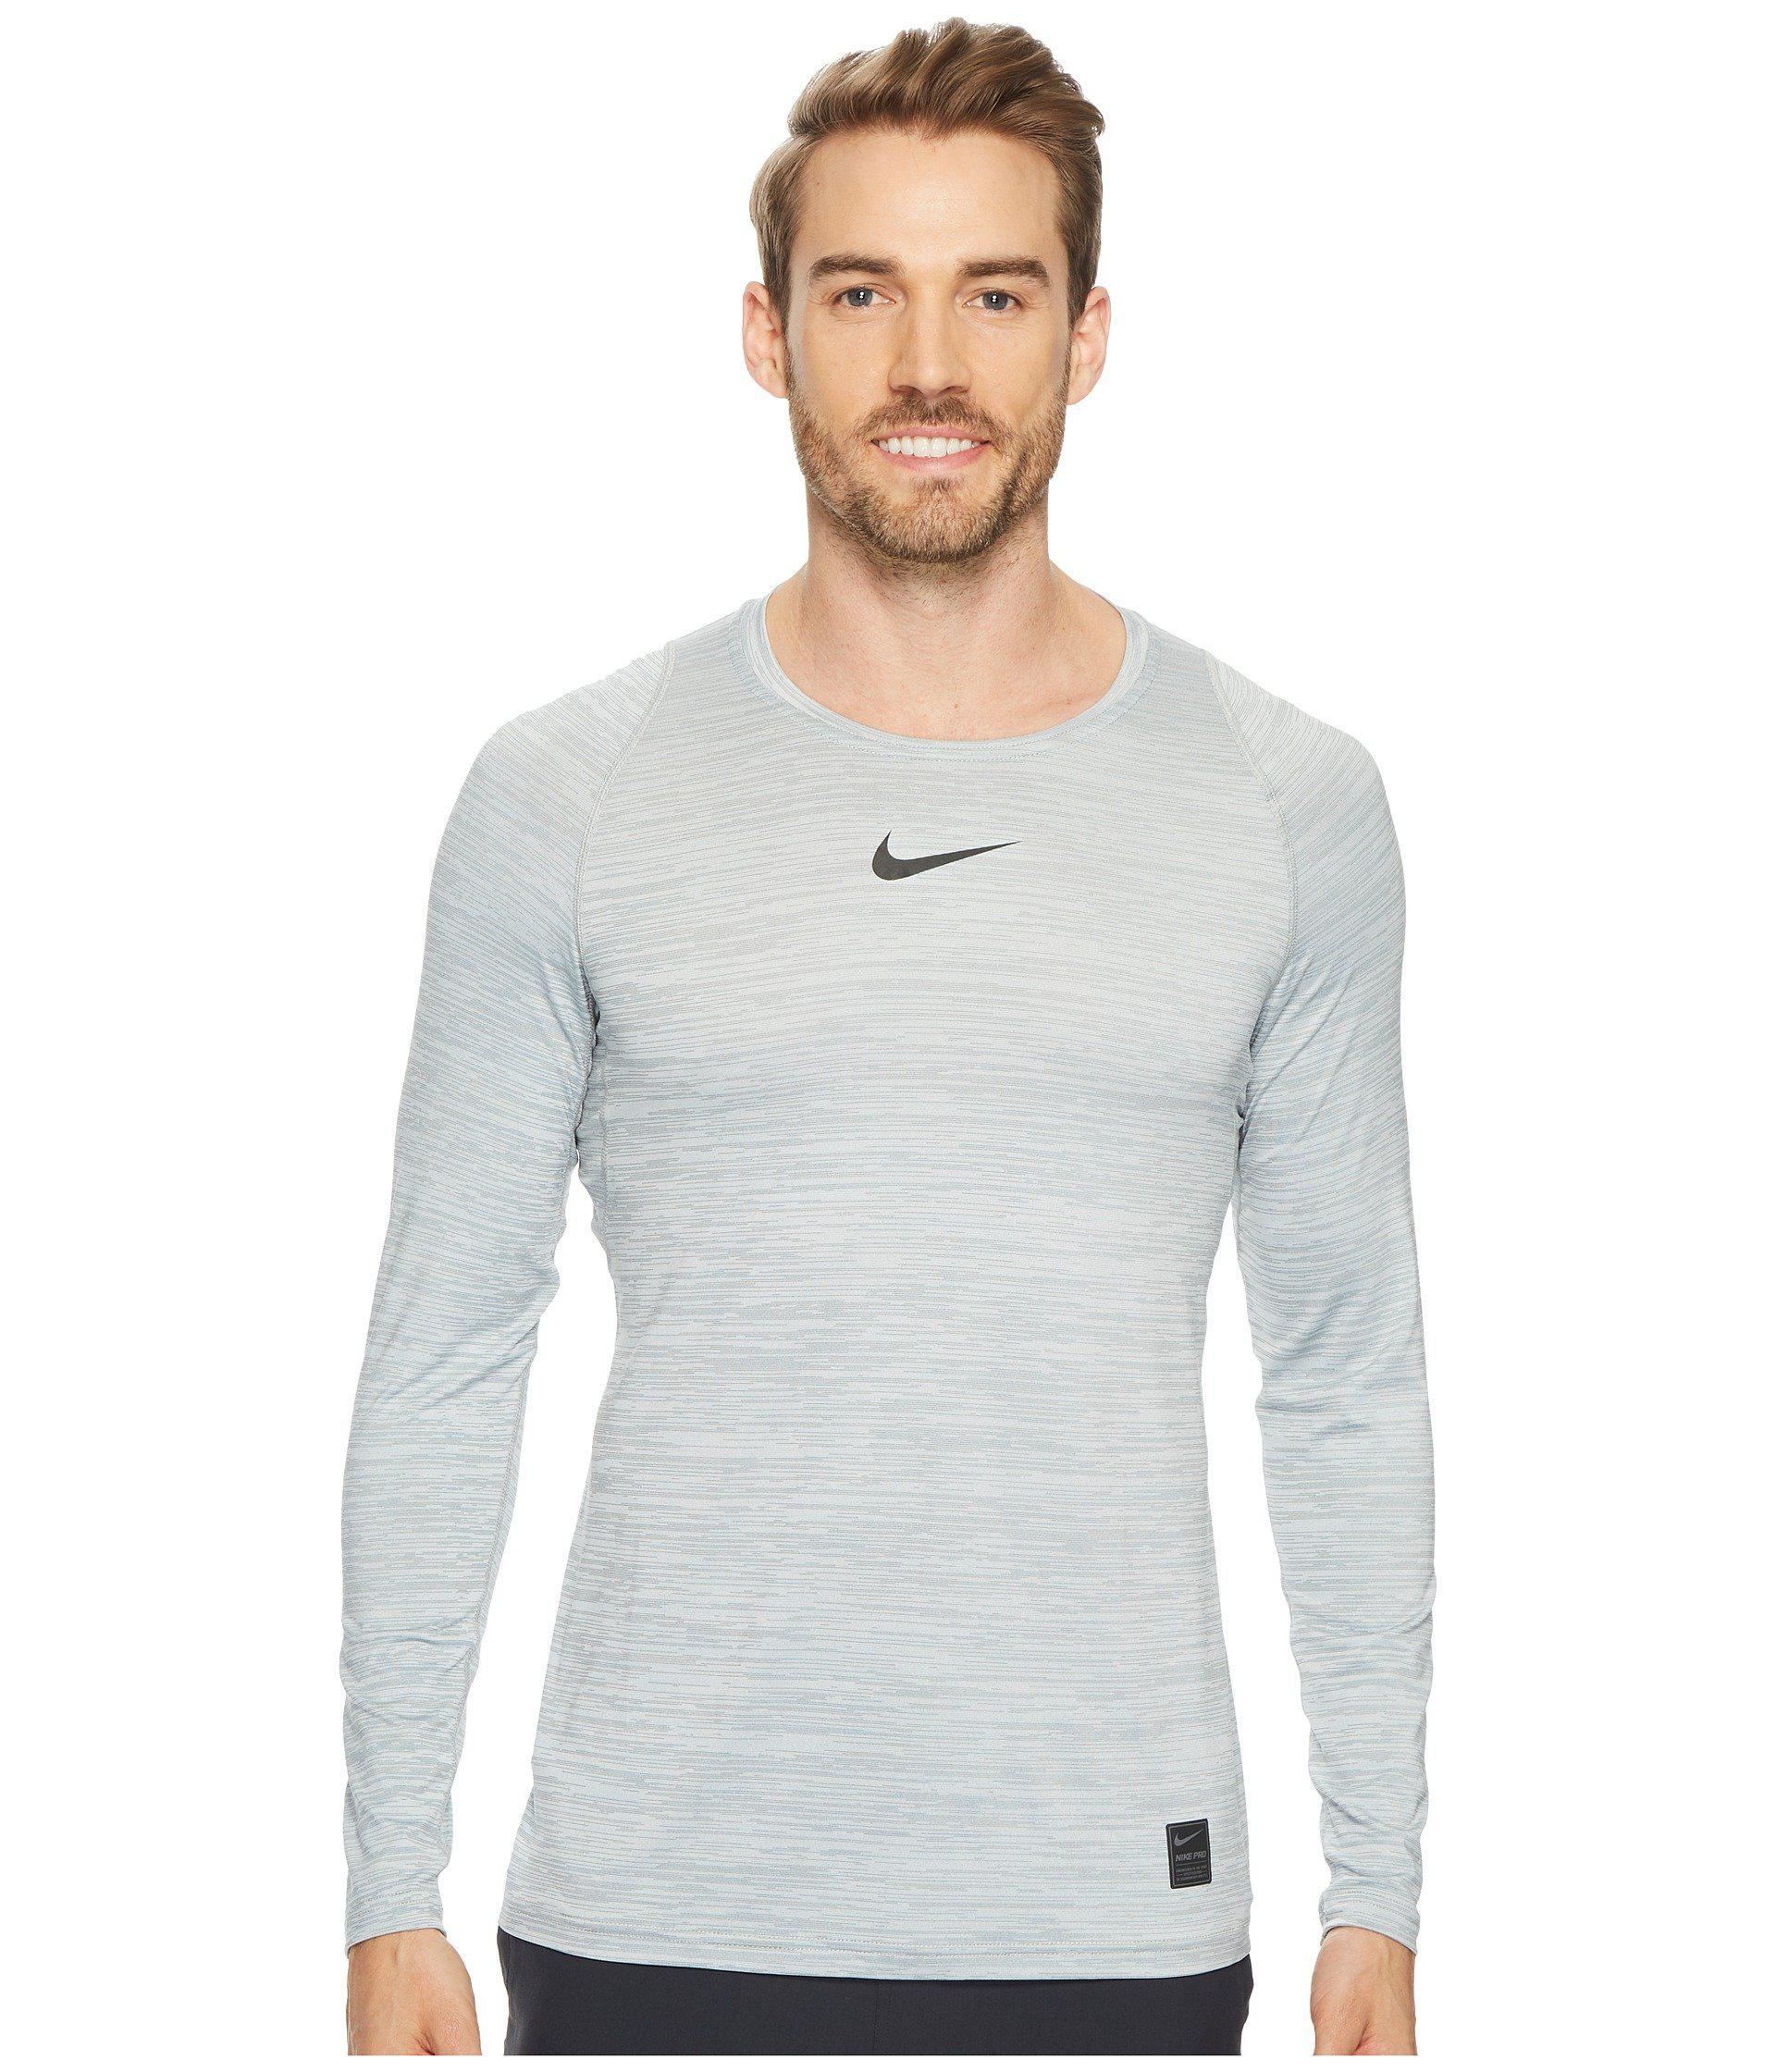 cc4bfd4de7442 Lyst - Nike Pro Heathered Long Sleeve Training Top (black cool Grey ...